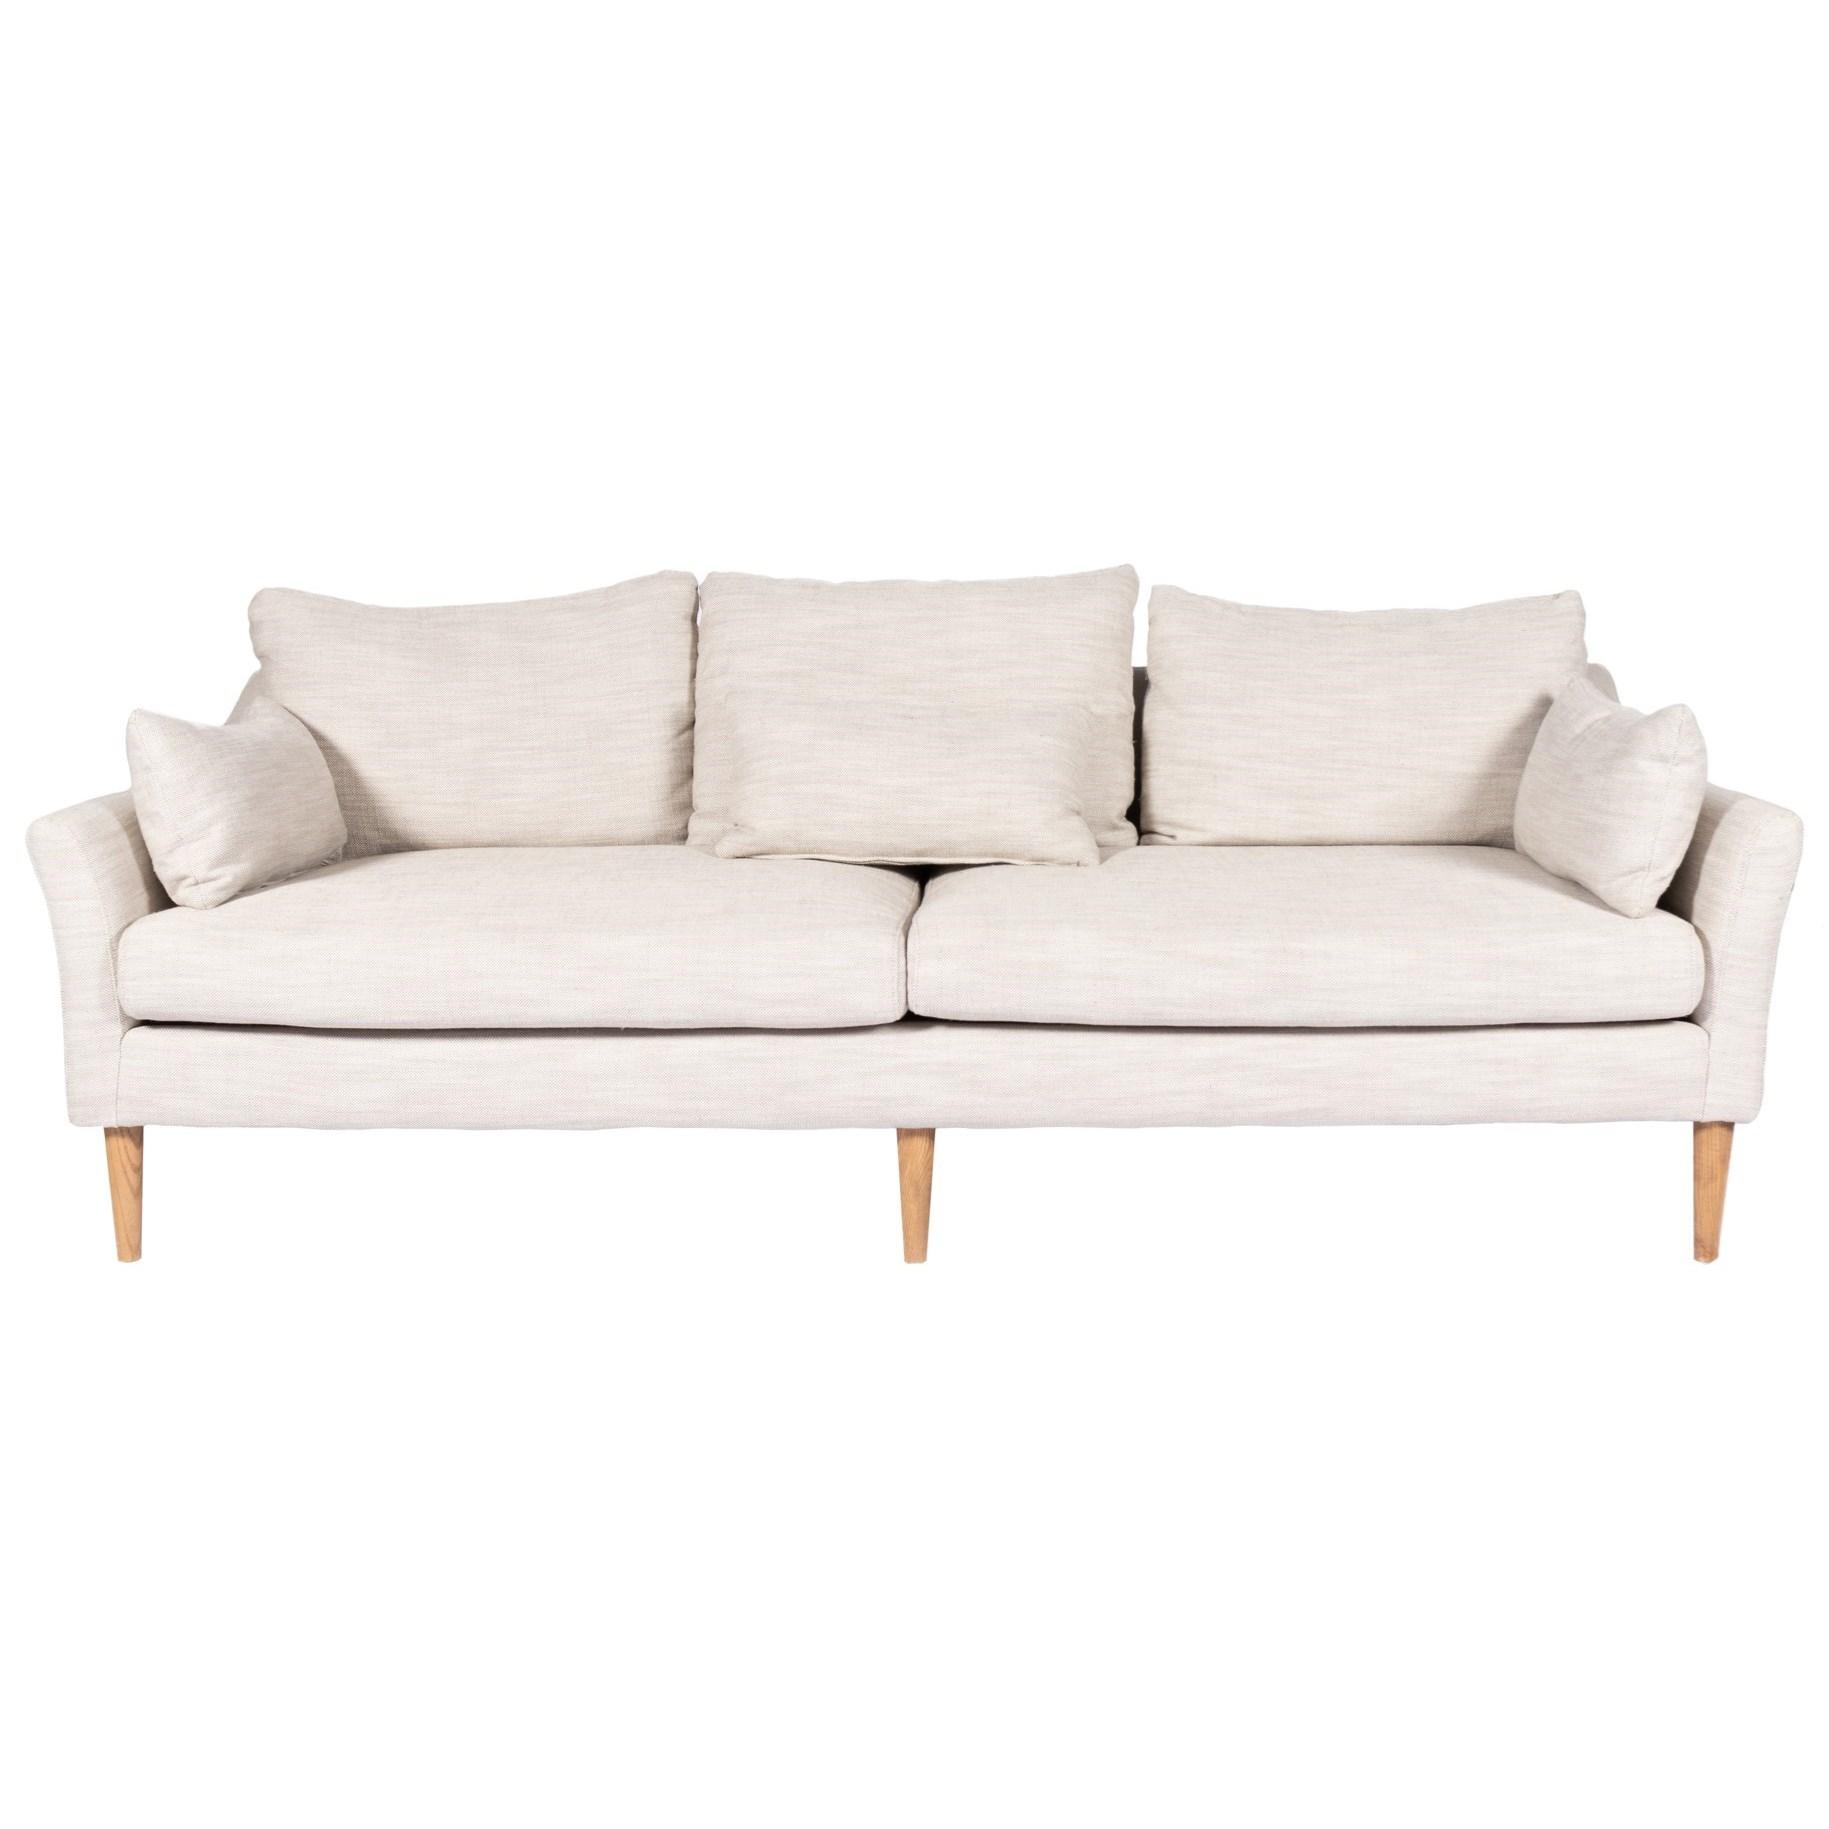 Transitonal Sofa